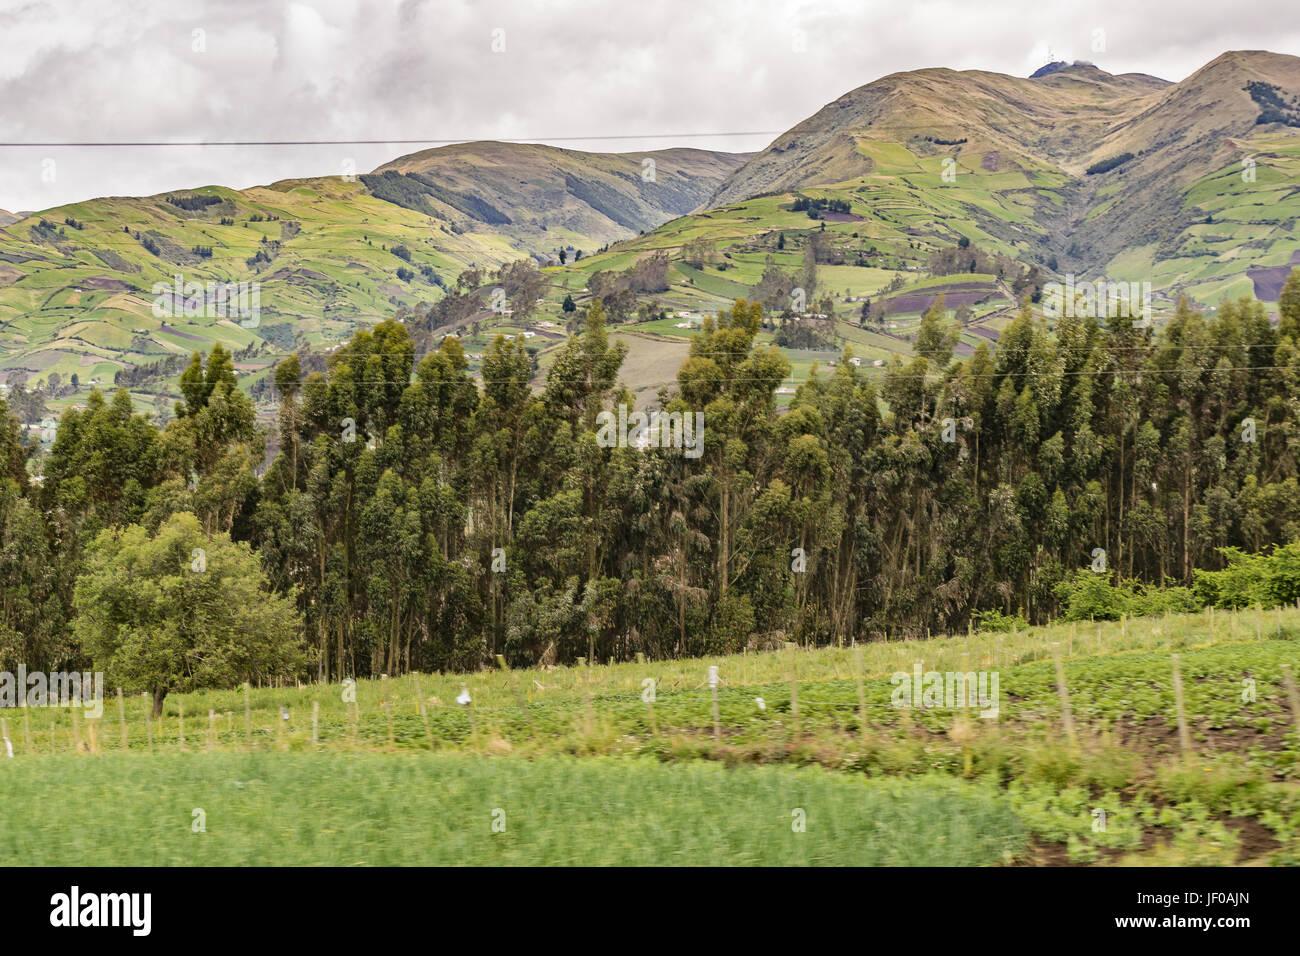 Ecuador Landscape Scene at Andes Range - Stock Image